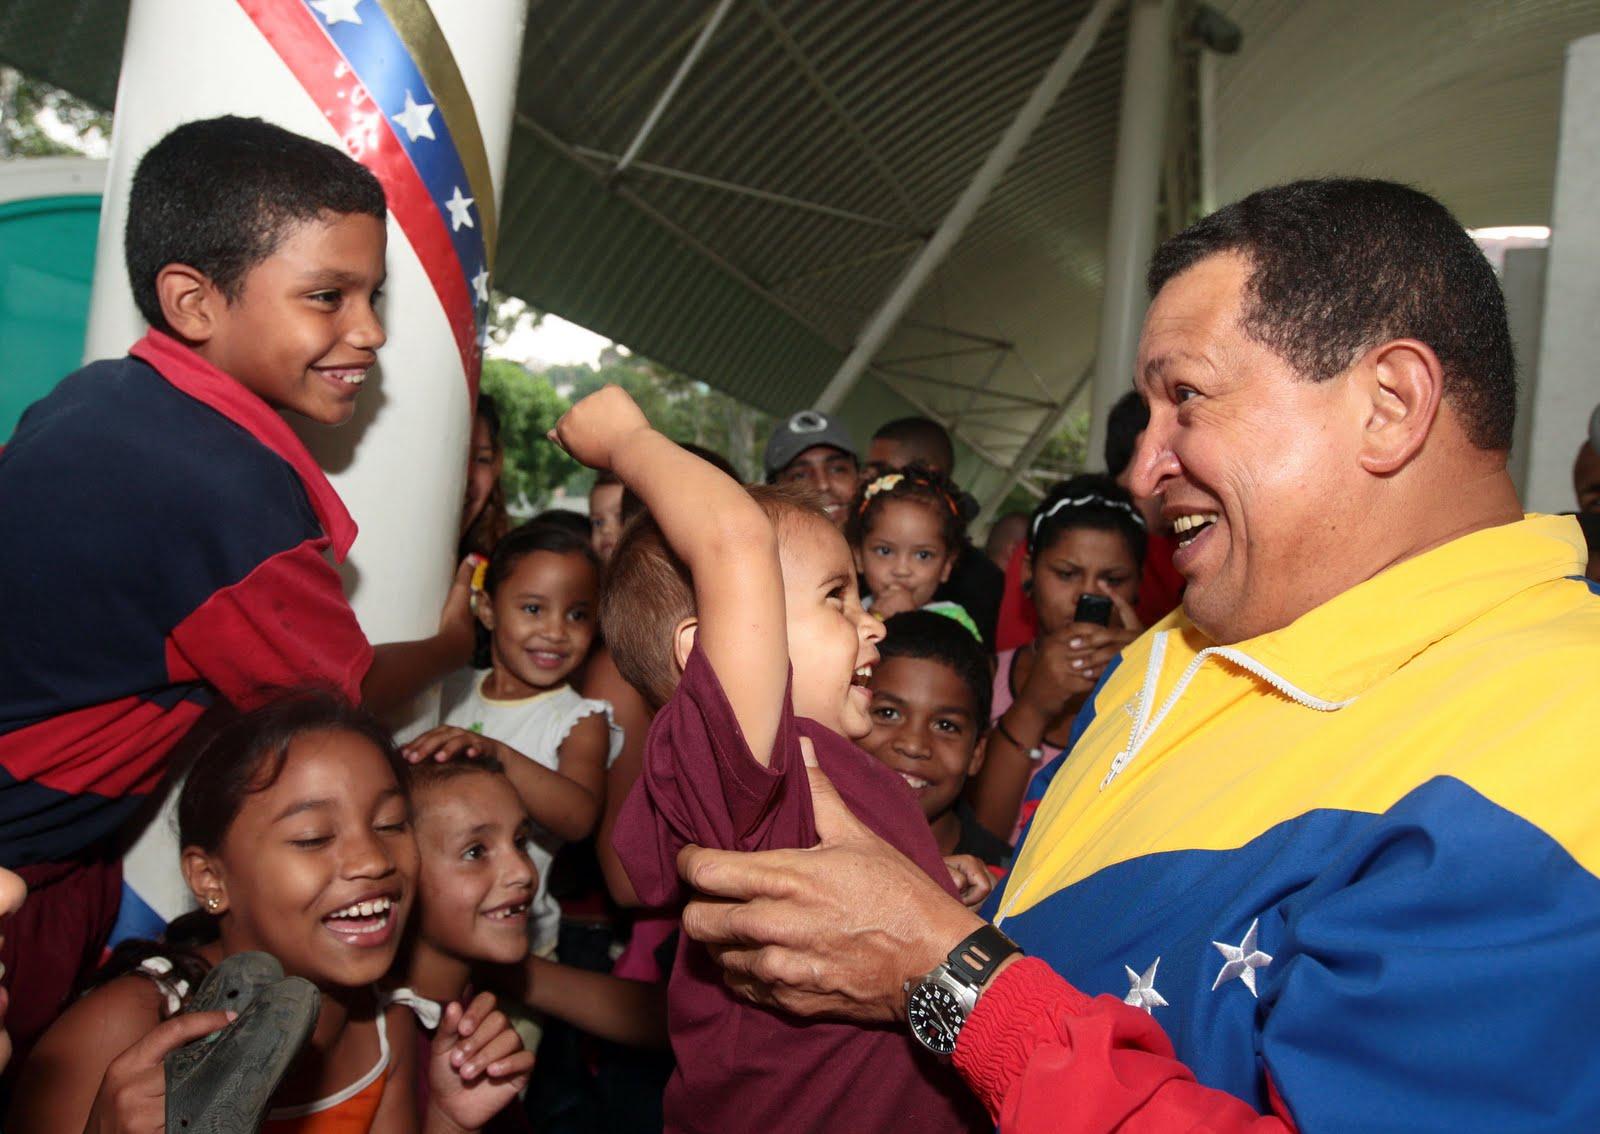 http://2.bp.blogspot.com/-Hy4lTrfaqlk/UTdaPkG2dkI/AAAAAAAACkI/3F3TScEBVKY/s1600/Chavez-y-ni%25C3%25B1os.jpg